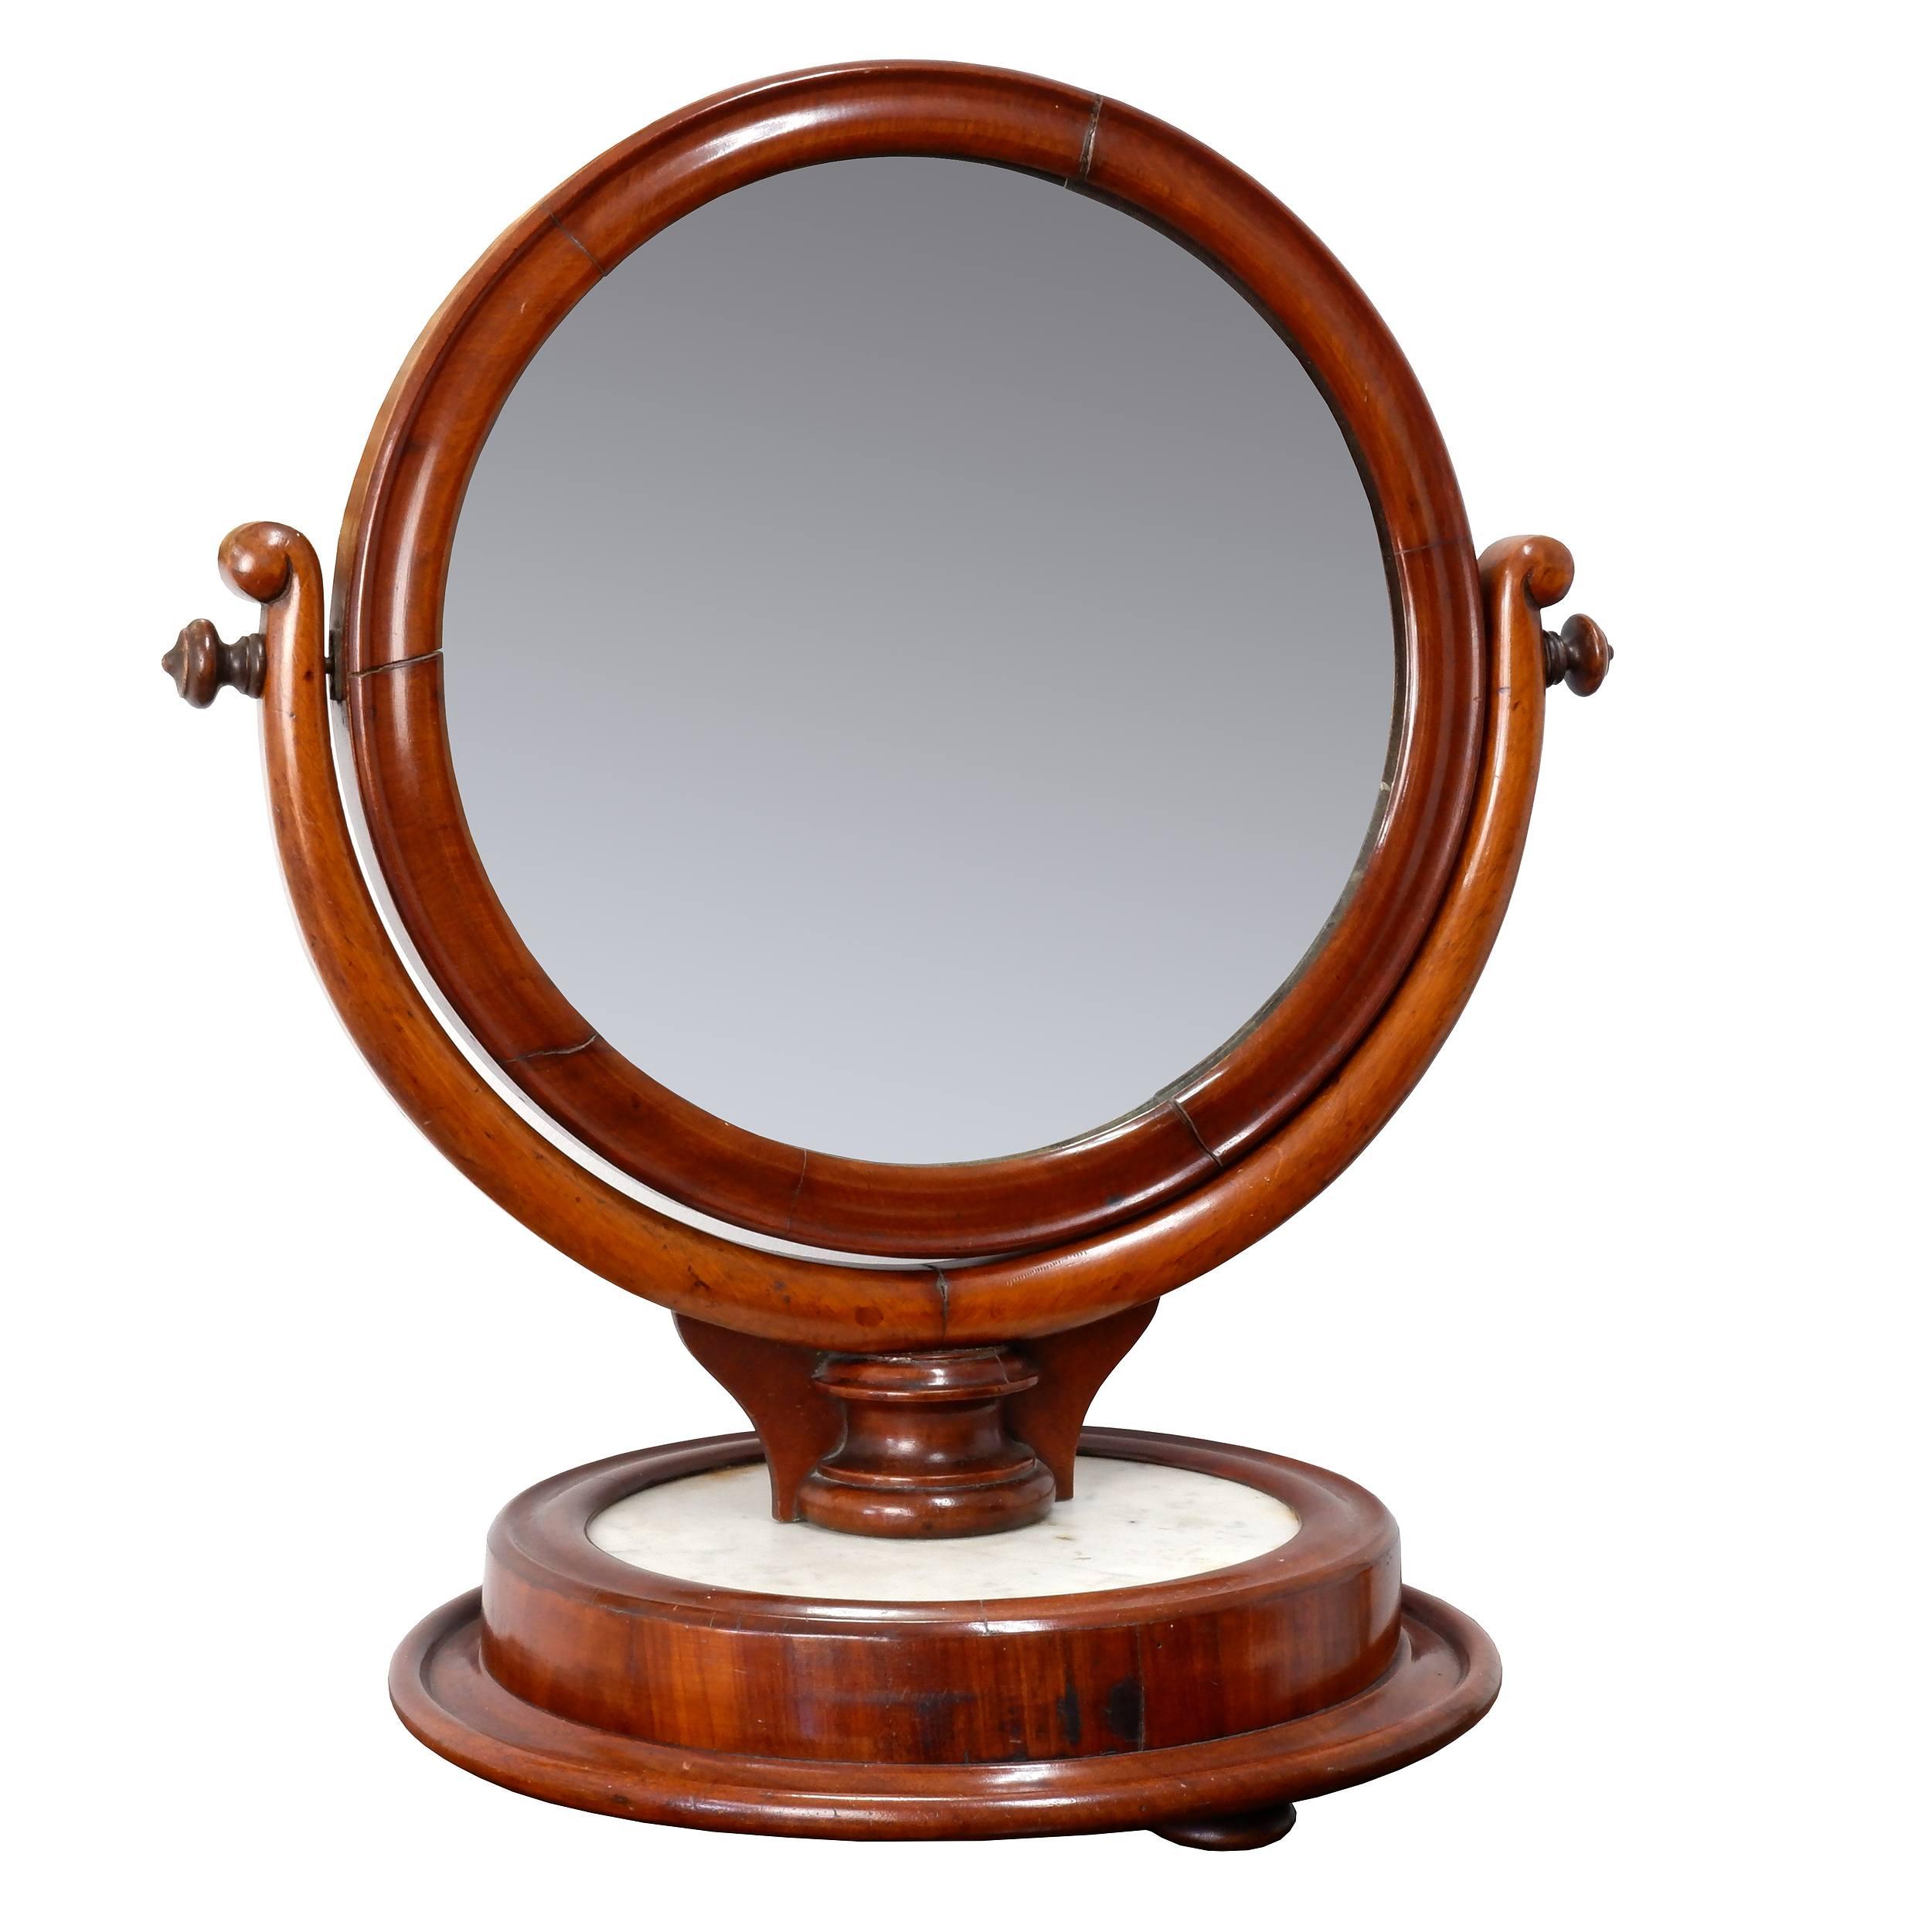 'Victorian Mahogany and Marble Shaving Mirror, Circa 1880'